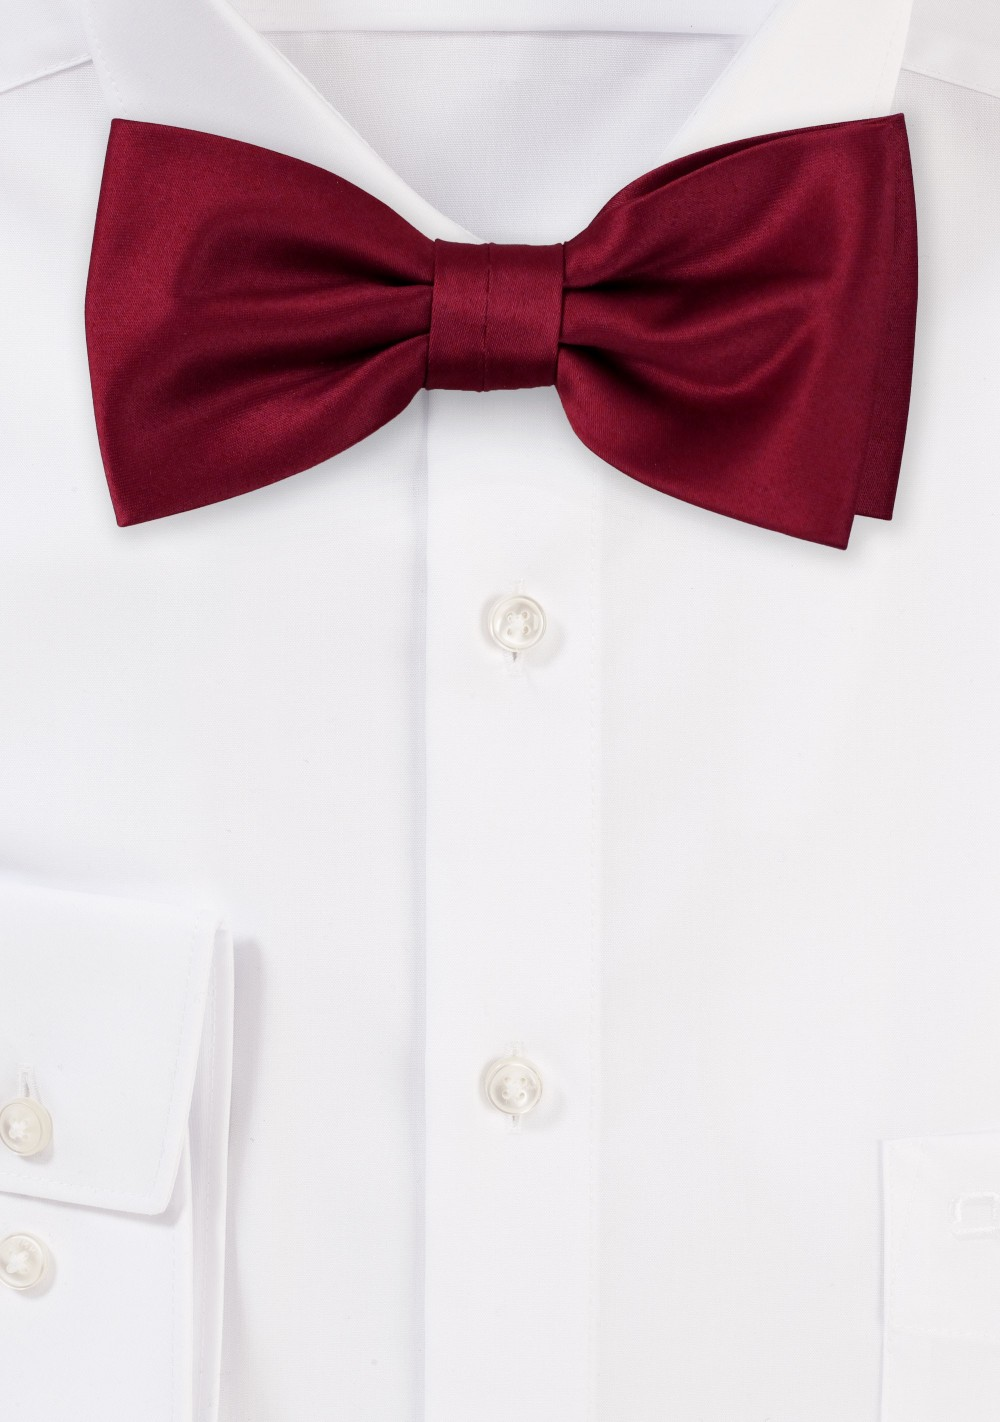 Burgundy Satin Bow Tie